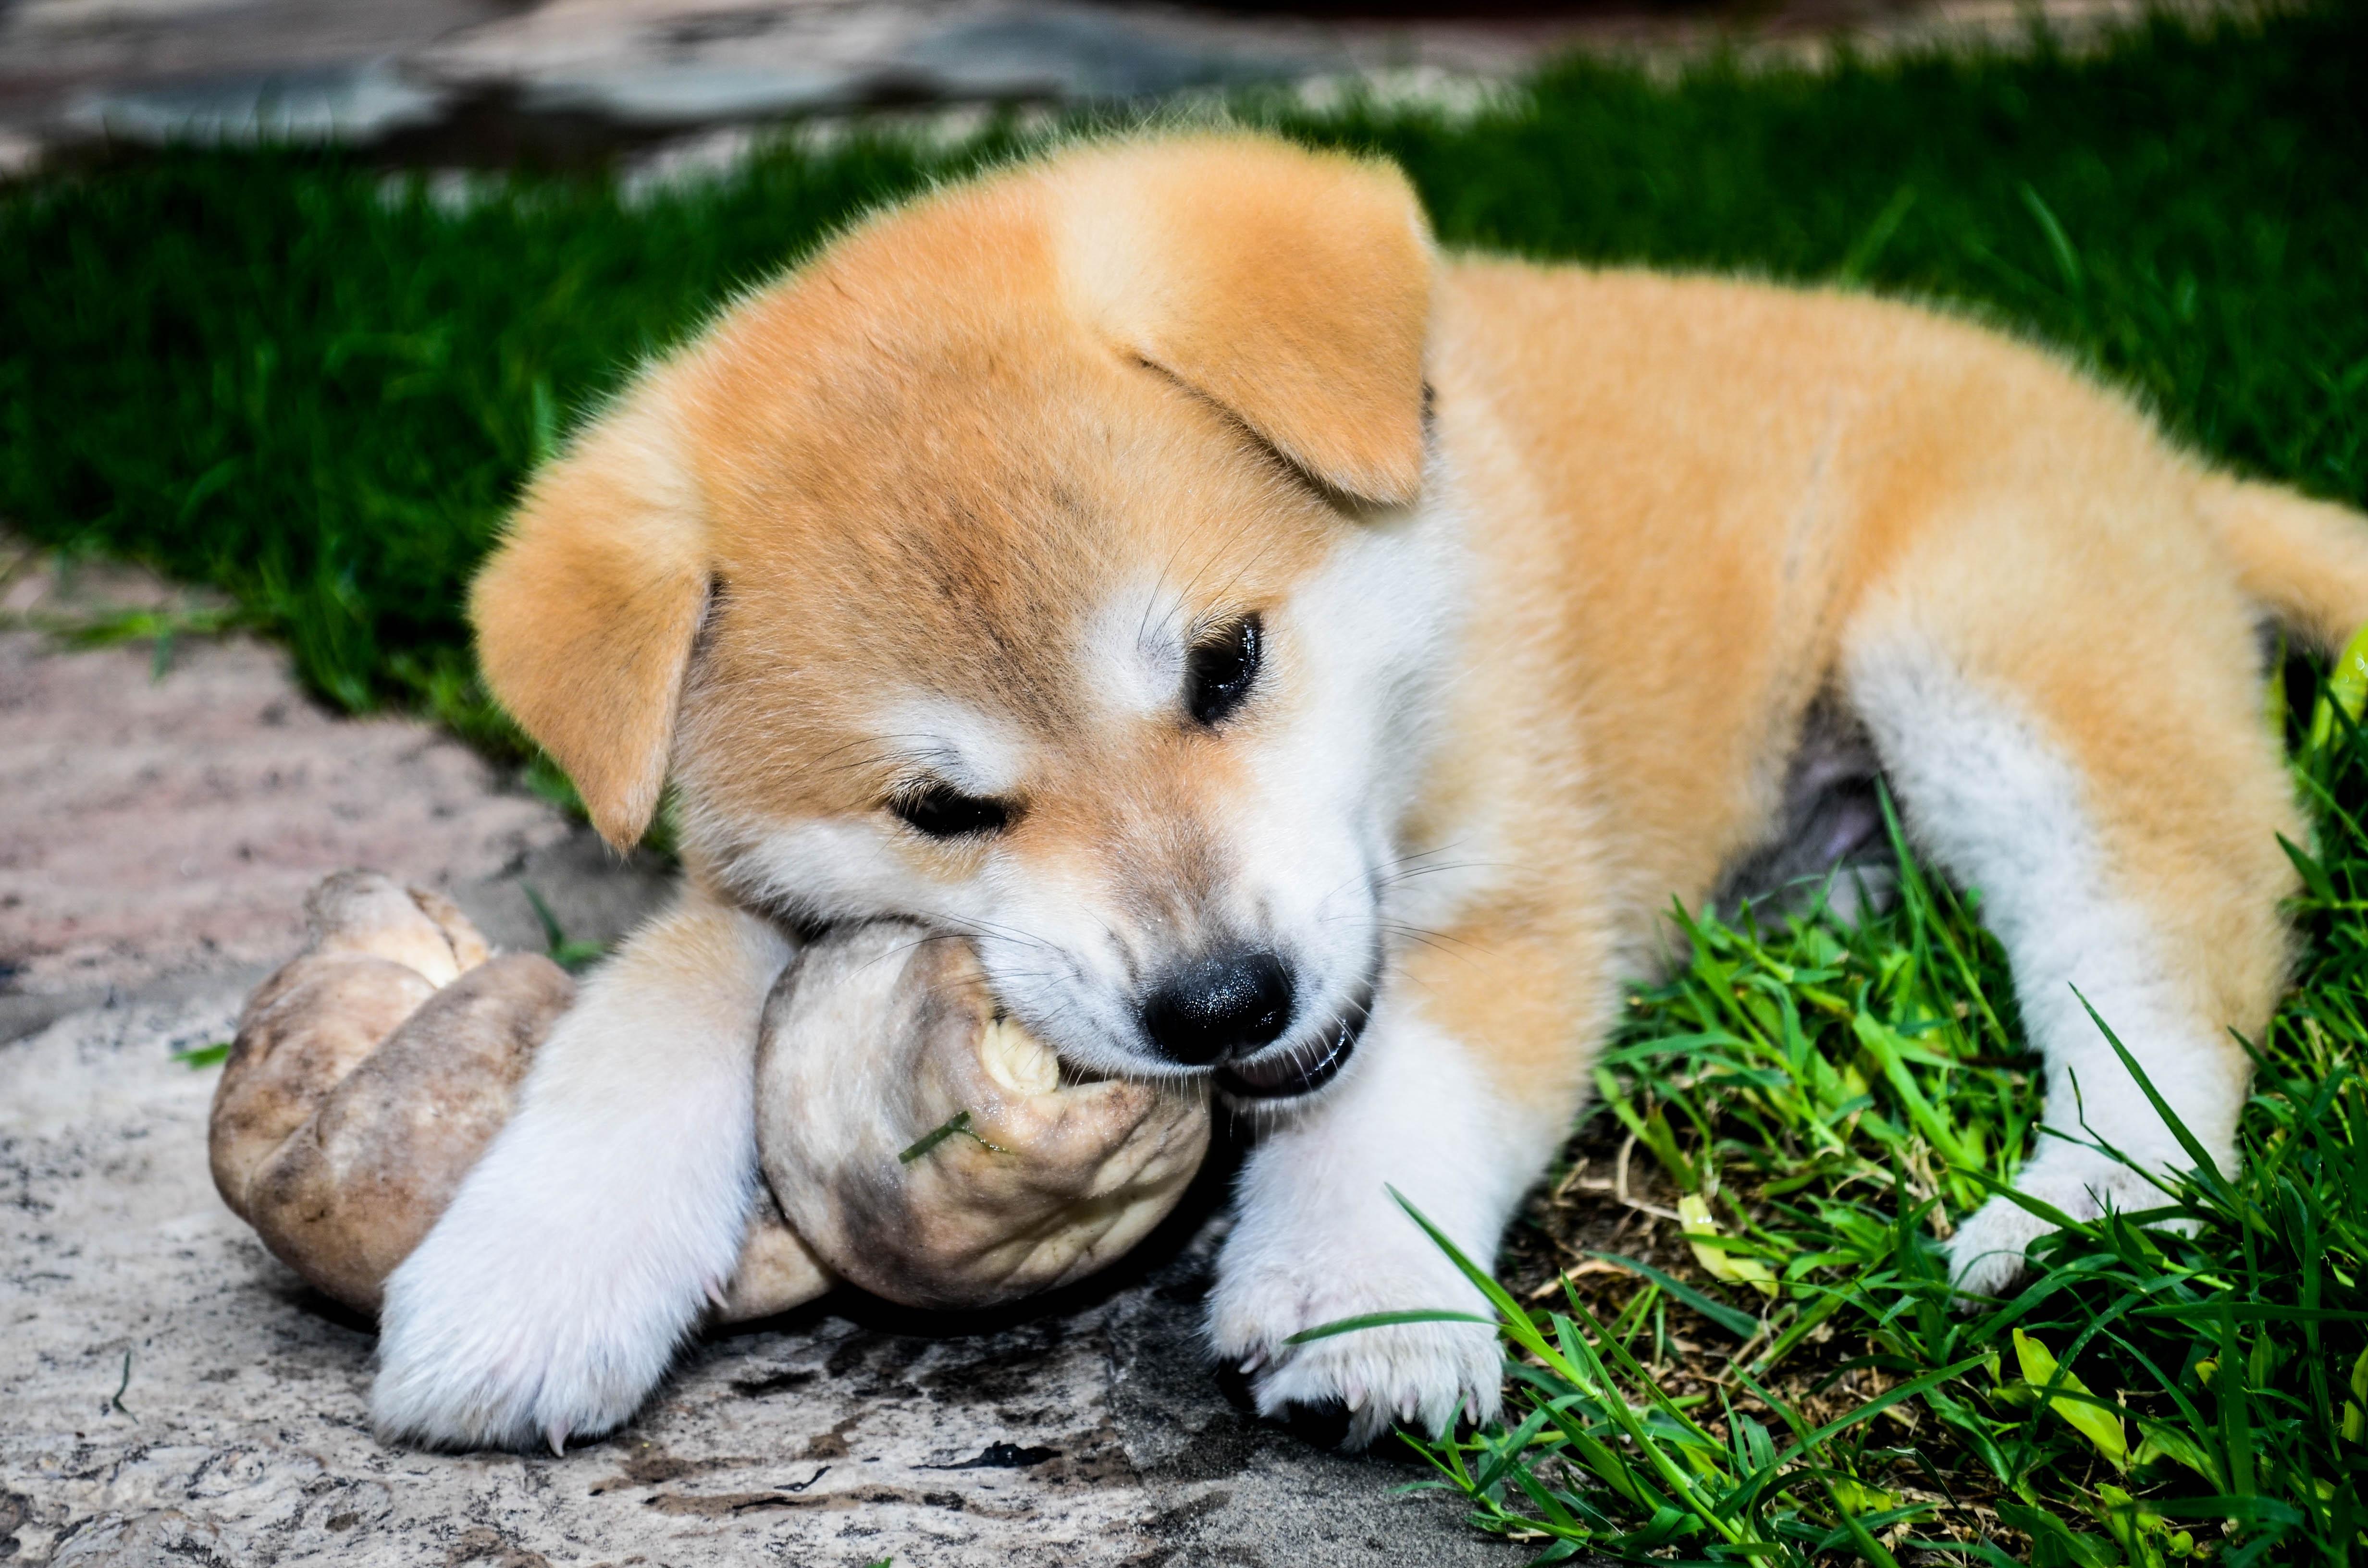 Gambar Anak Anjing Wanita Binatang Menyusui Tulang Ras Makanan Hewan Bertulang Belakang Paus Jenis Anjing Shiba Inu Cachorra Akita Inu Anjing Jindo Korea Shikoku Anjing Seperti Mamalia Carnivora Kelompok Jenis Anjing